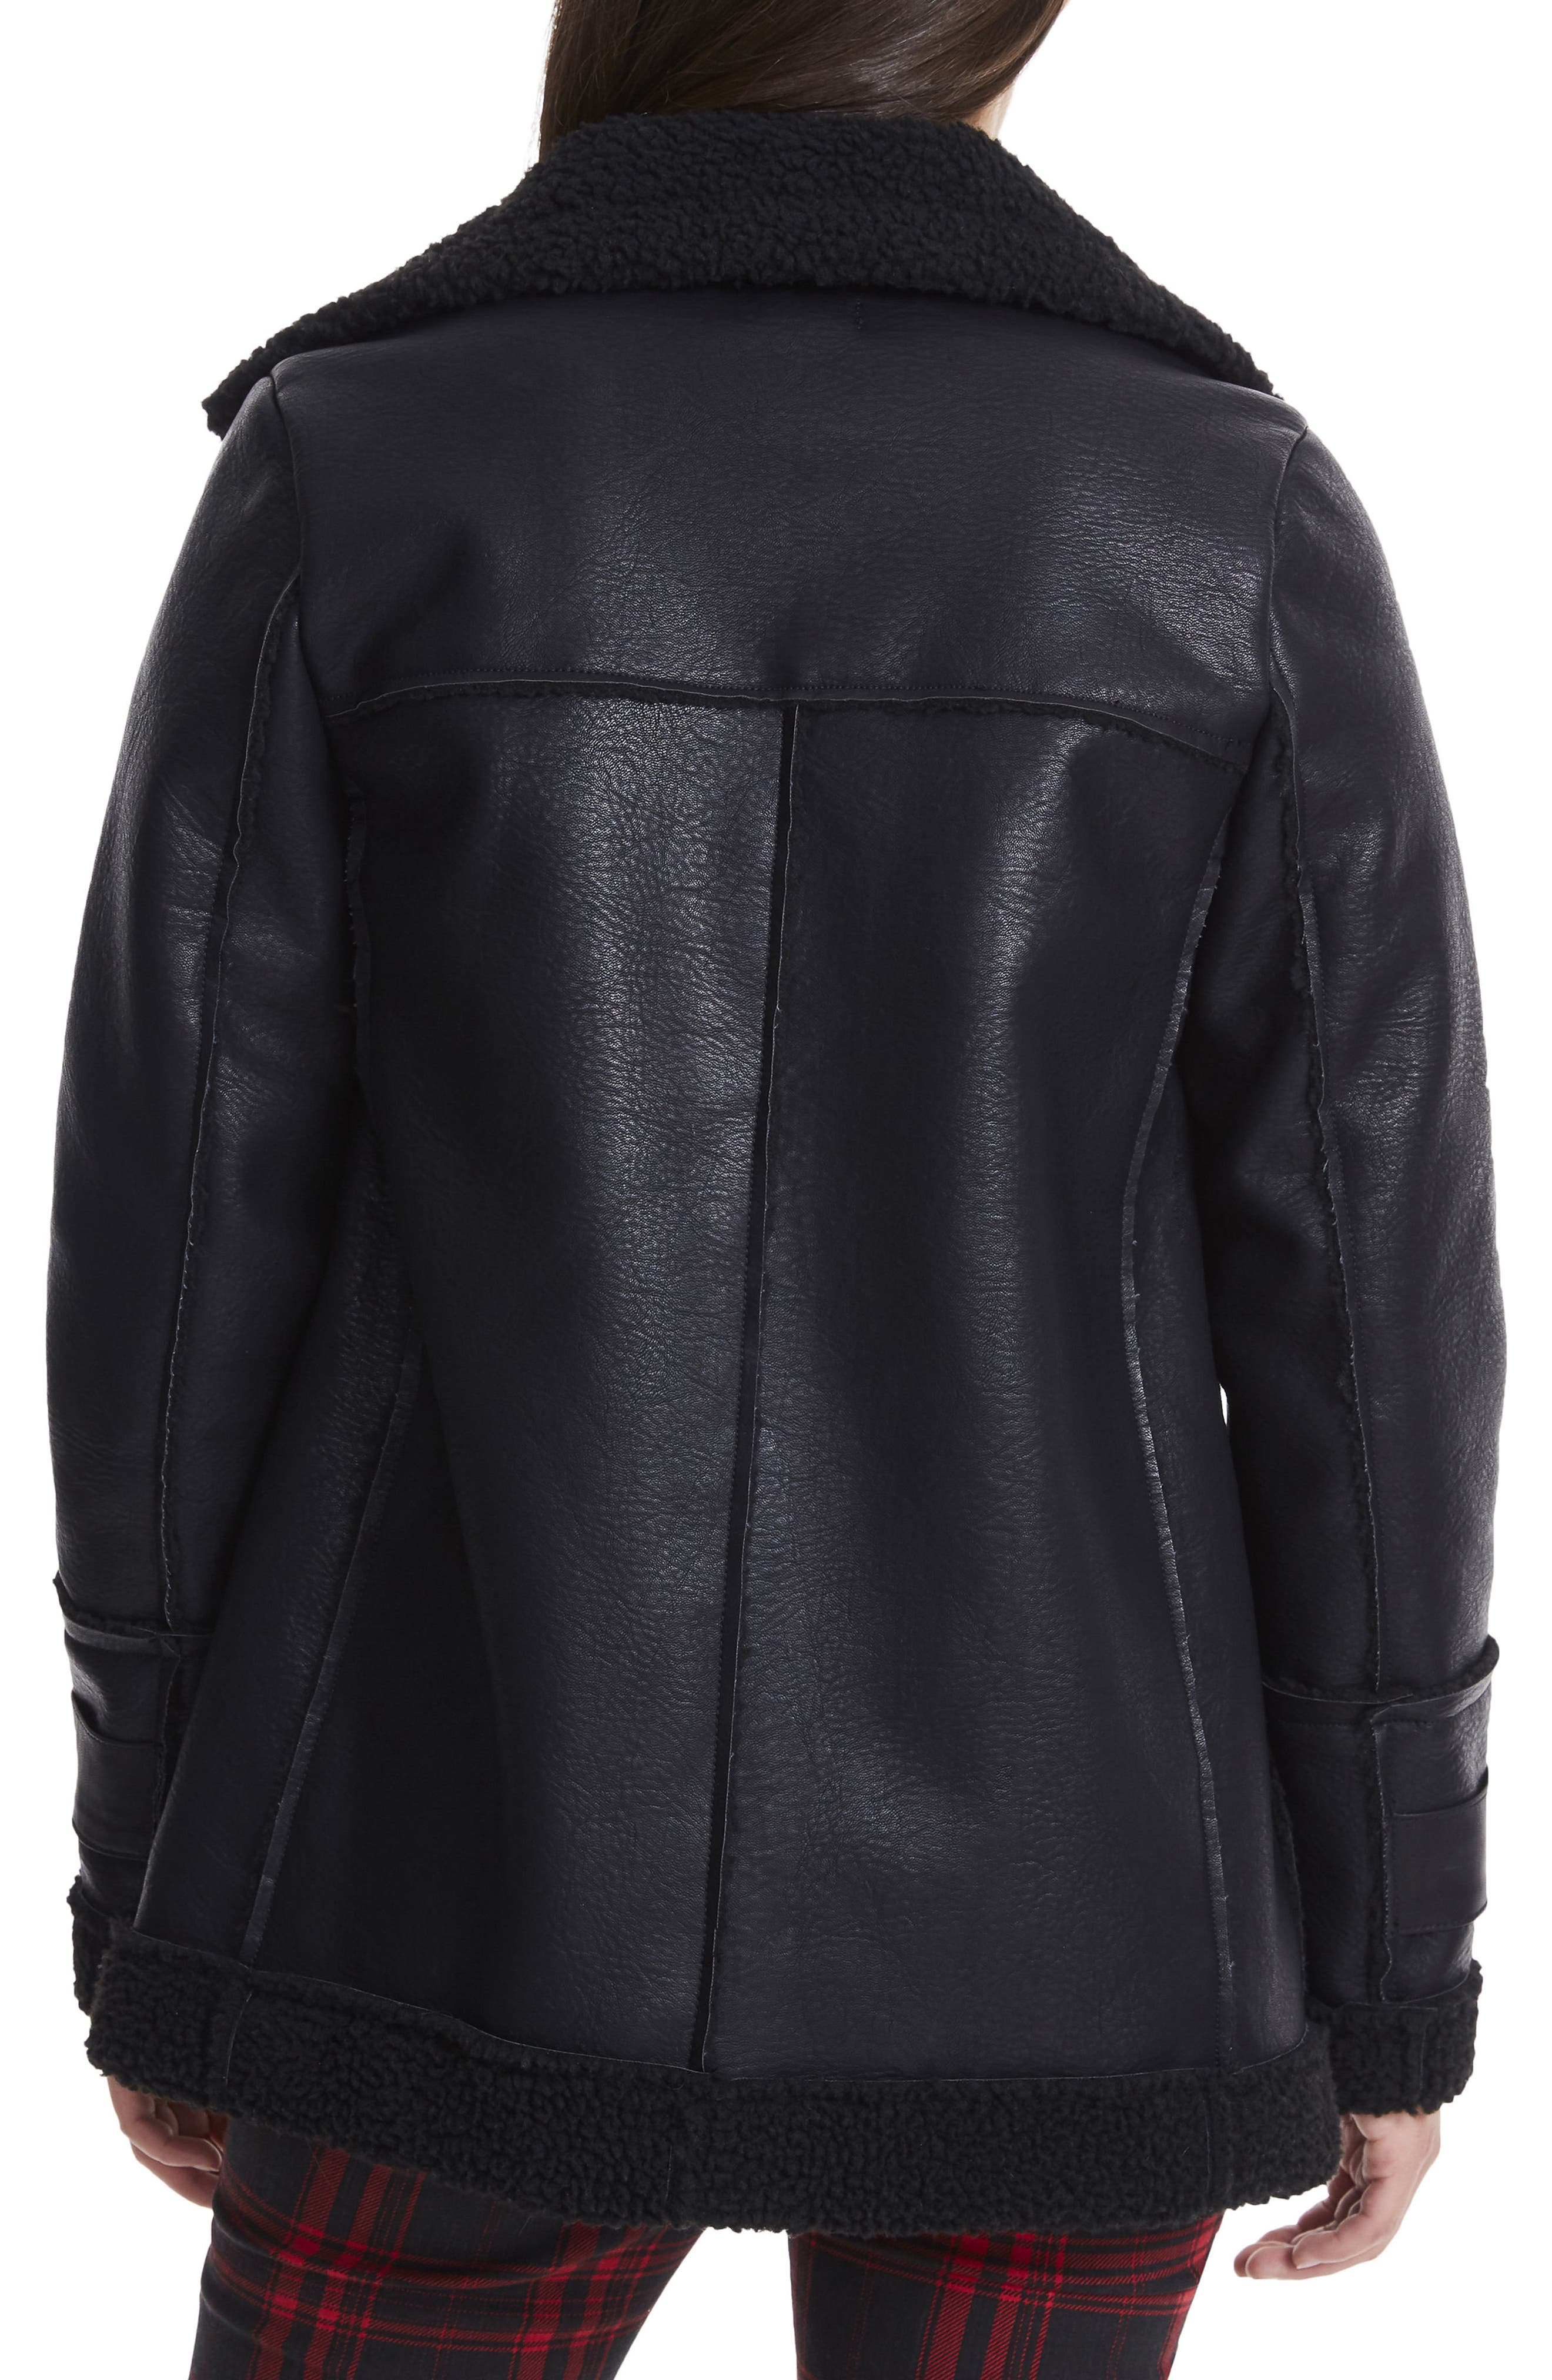 Opelia Oversize Faux Shearling Jacket,                             Alternate thumbnail 2, color,                             001